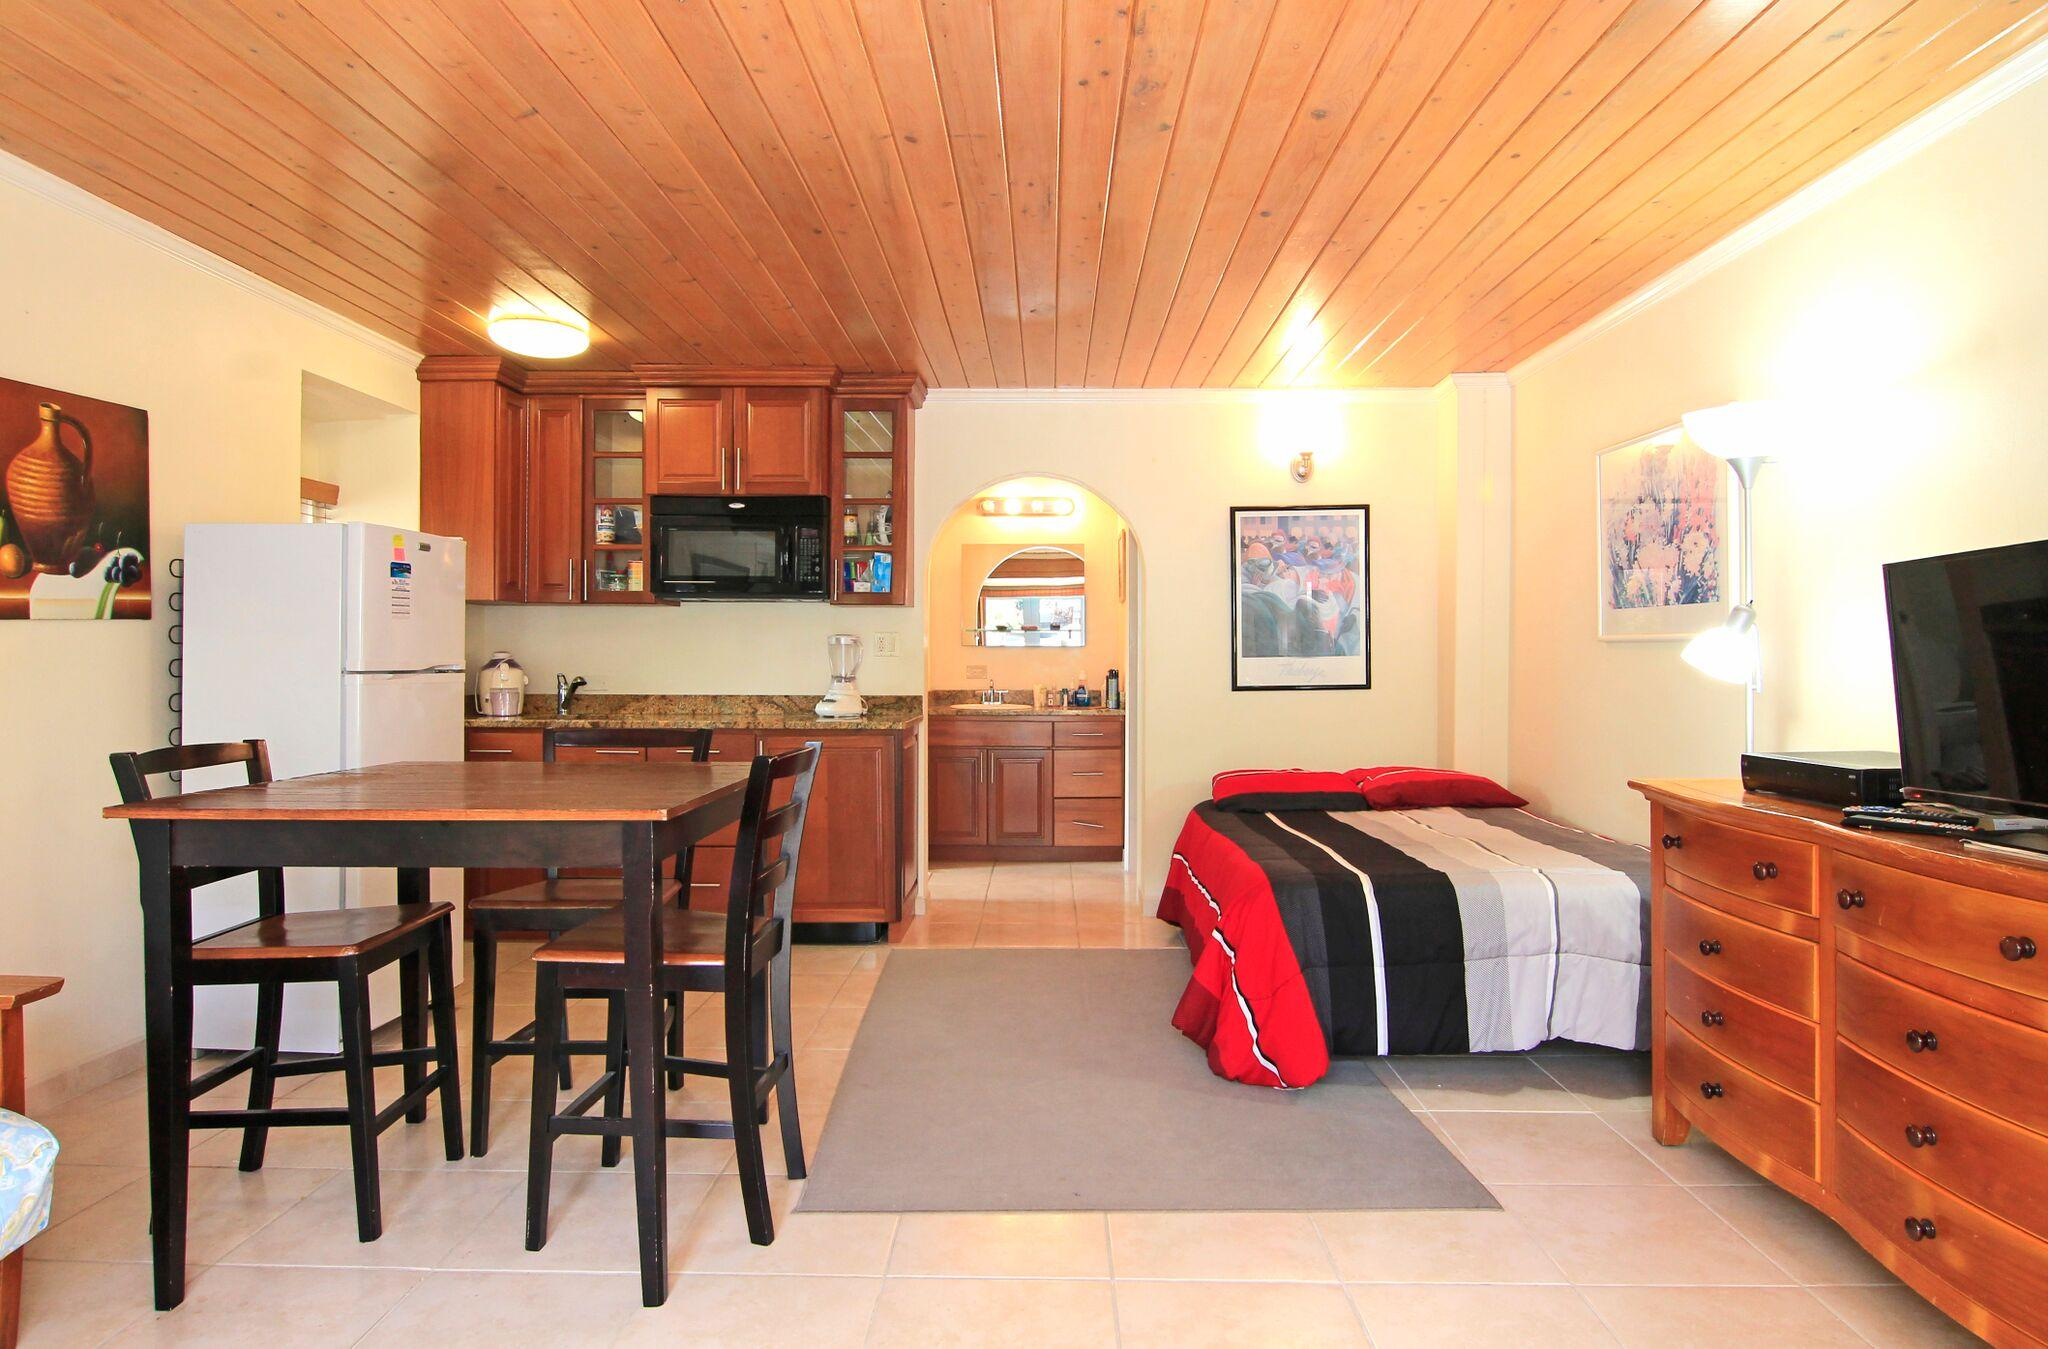 Studio Living Area Overview